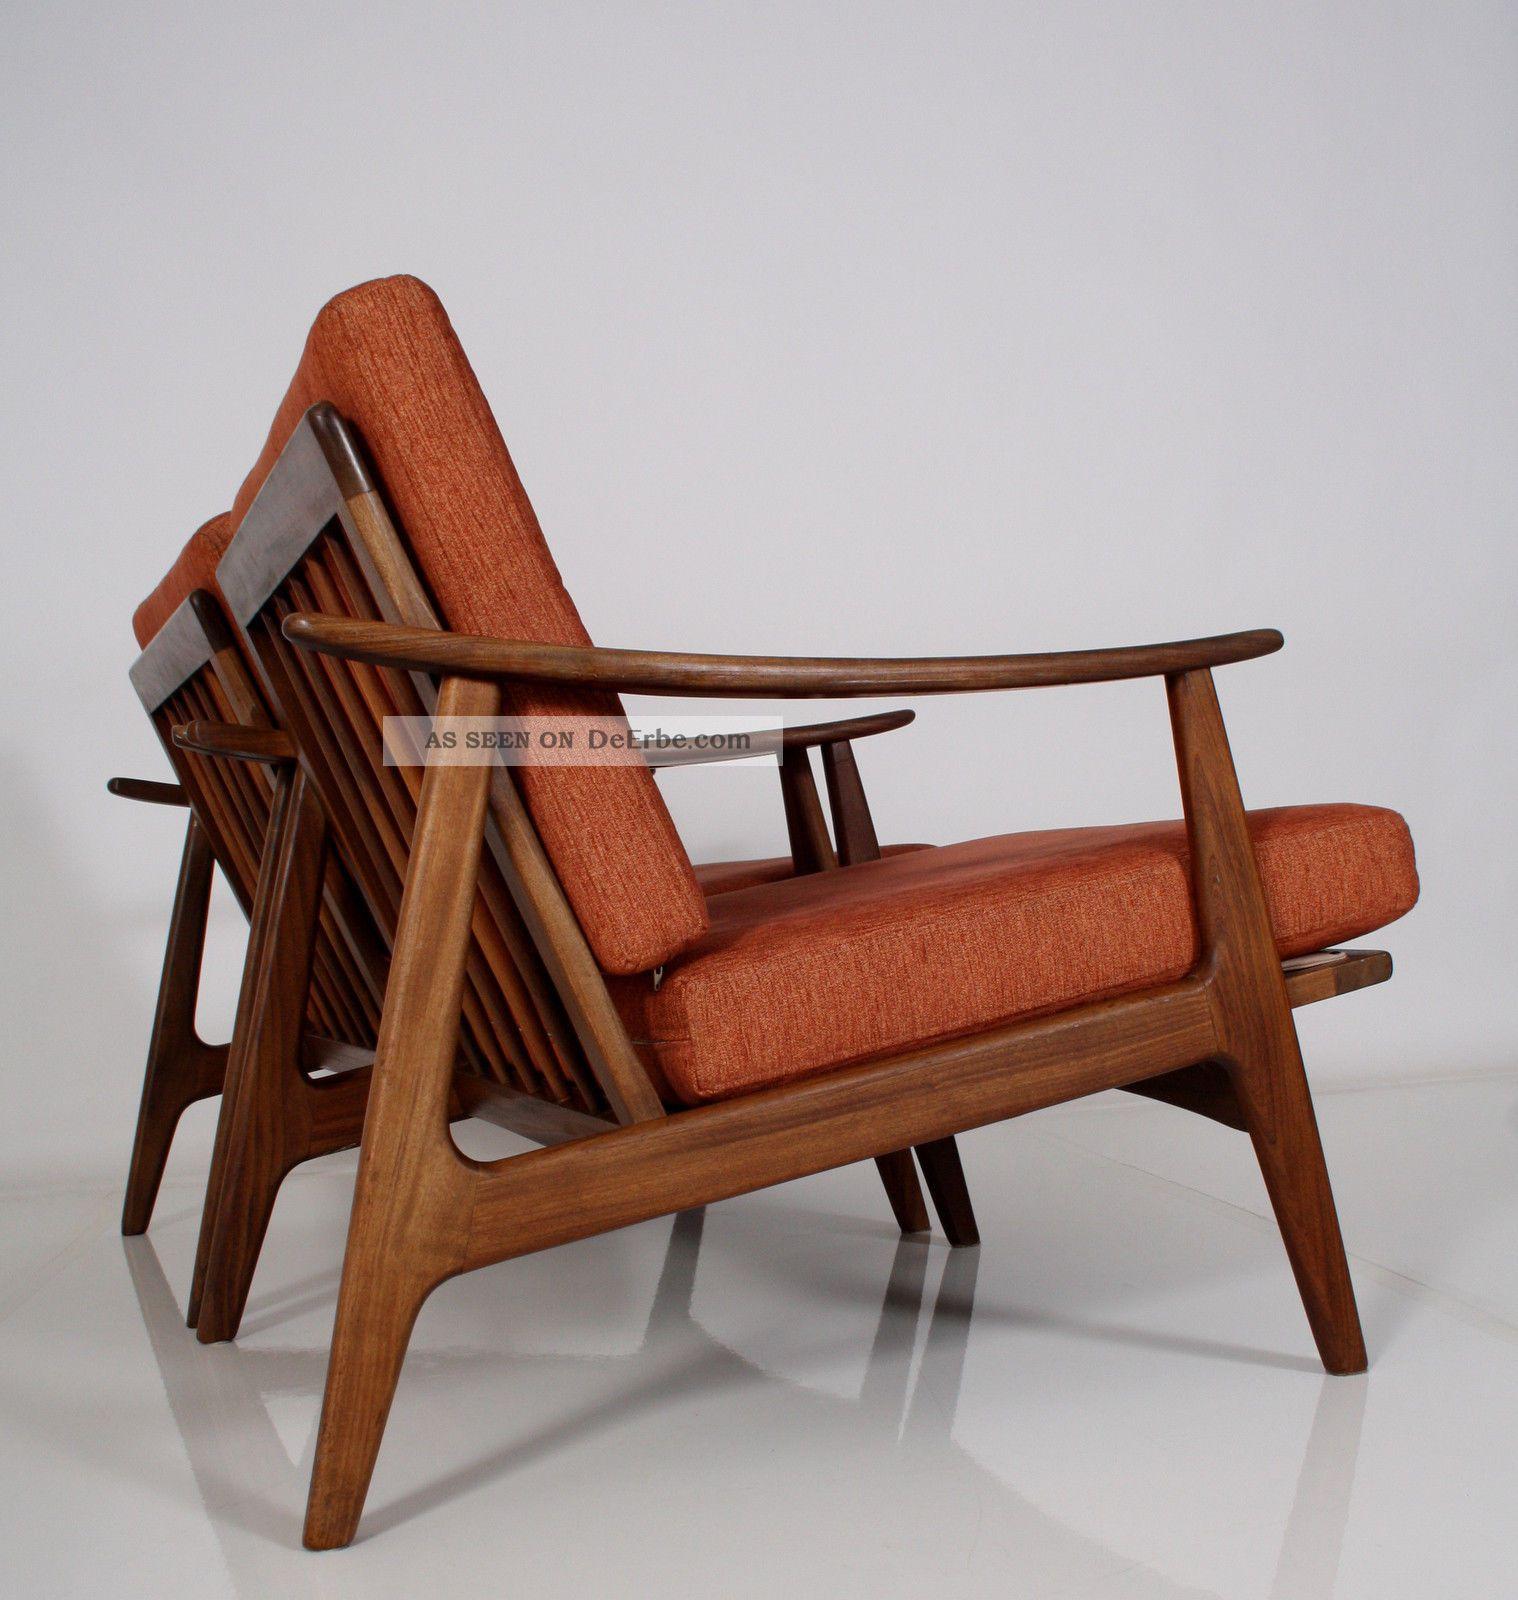 2 60er Teak Sessel Danish Design Top 60s Easy Chairs Fauteuil Poltrona